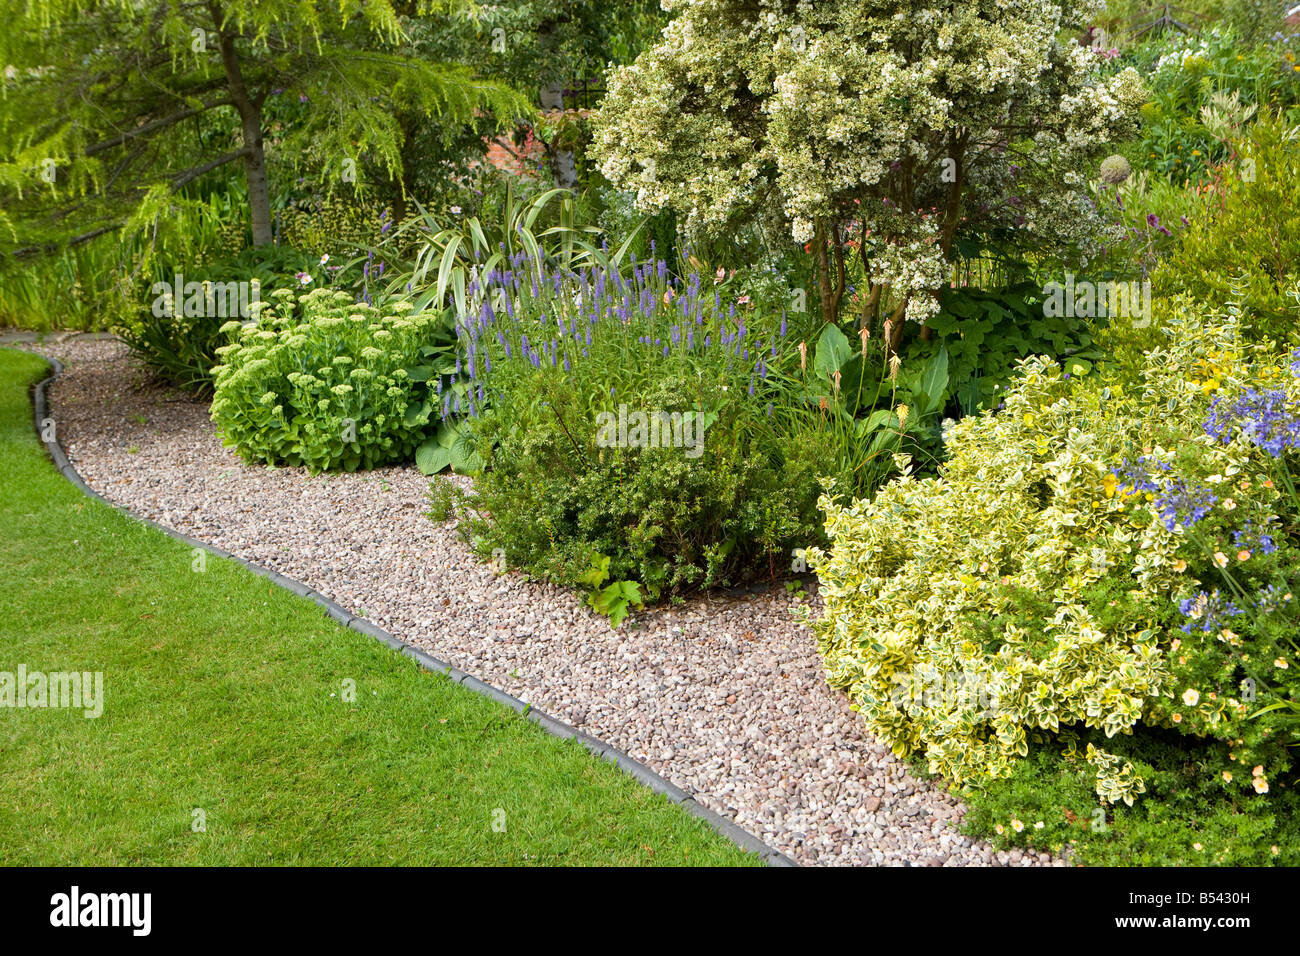 gravel path alongside lawn - Stock Image